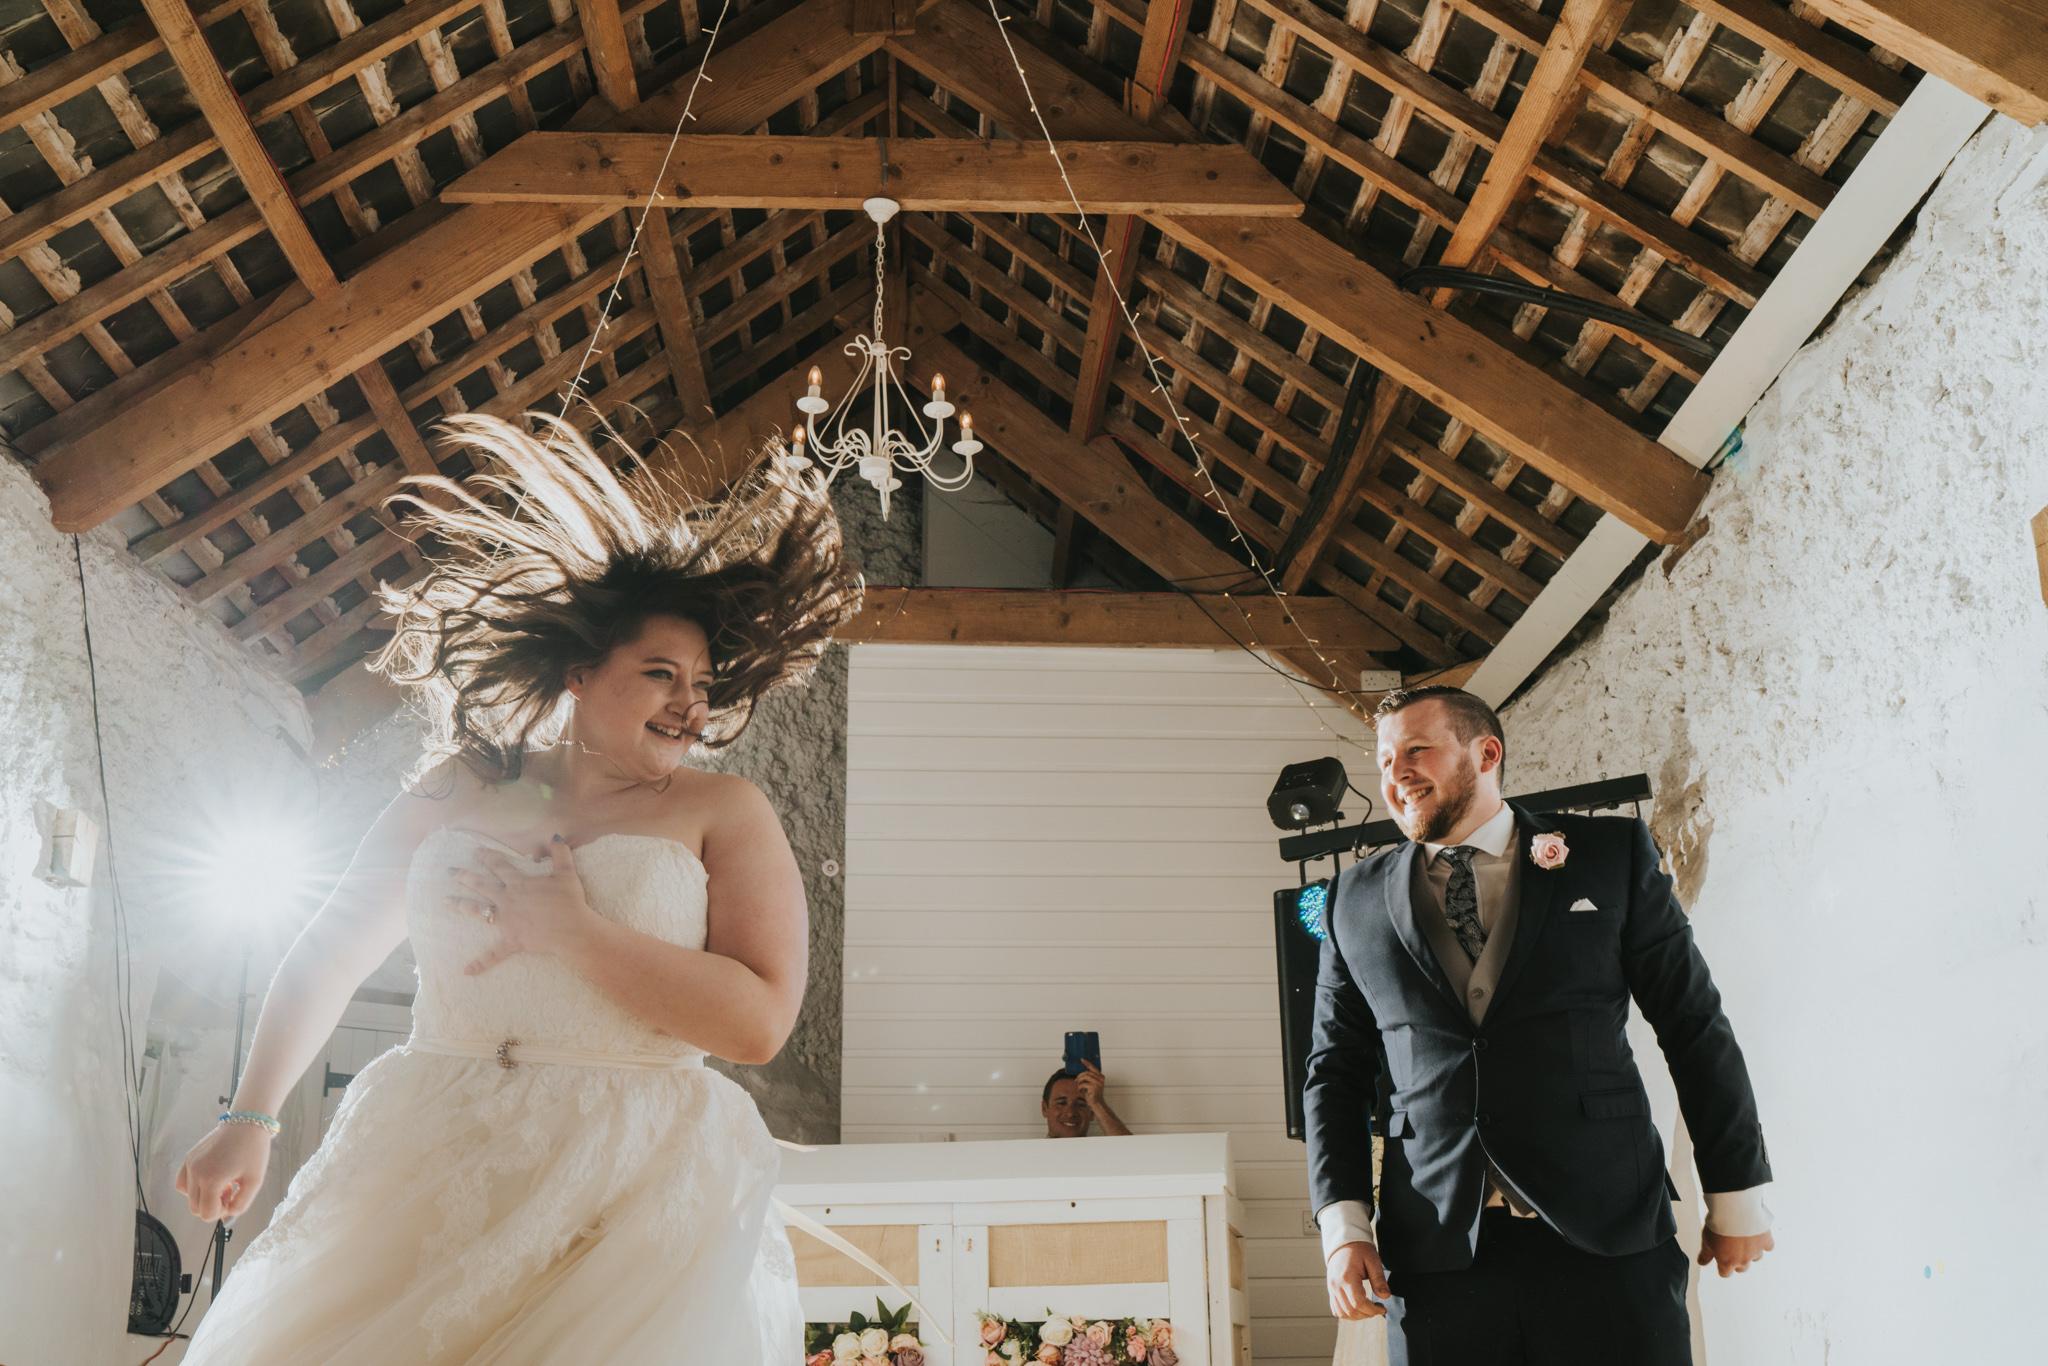 grace-sam-old-barn-clovelly-devon-wedding-photographer-grace-elizabeth-essex-suffolk-norfolk-wedding-photographer (121 of 132).jpg